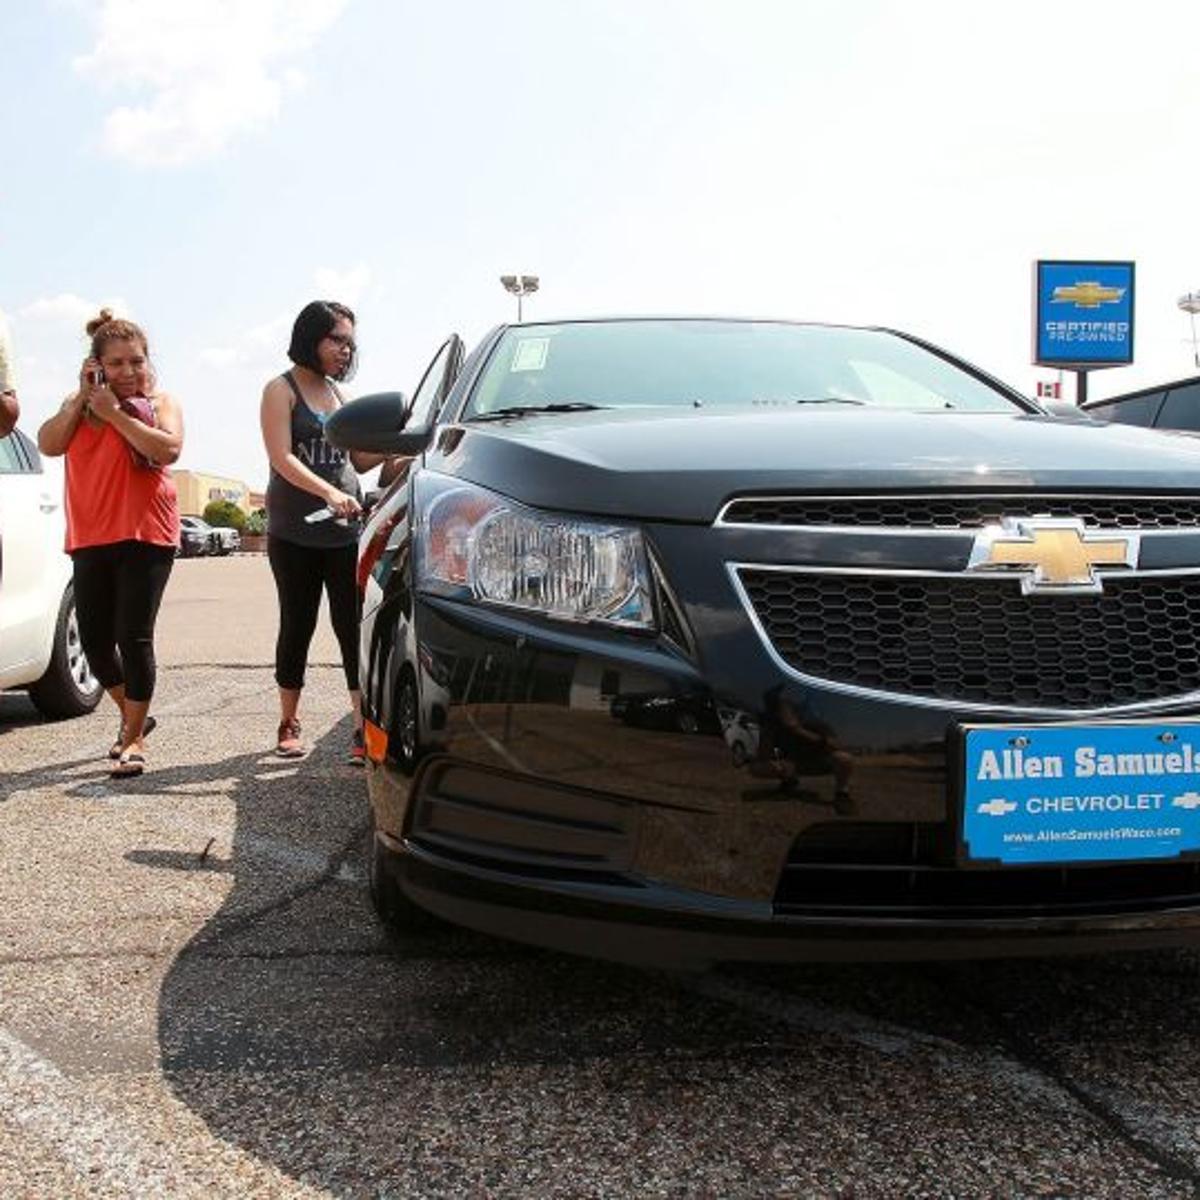 Allen Samuels Chevrolet Waco >> Autonation To Buy Waco Based Allen Samuels Auto Group